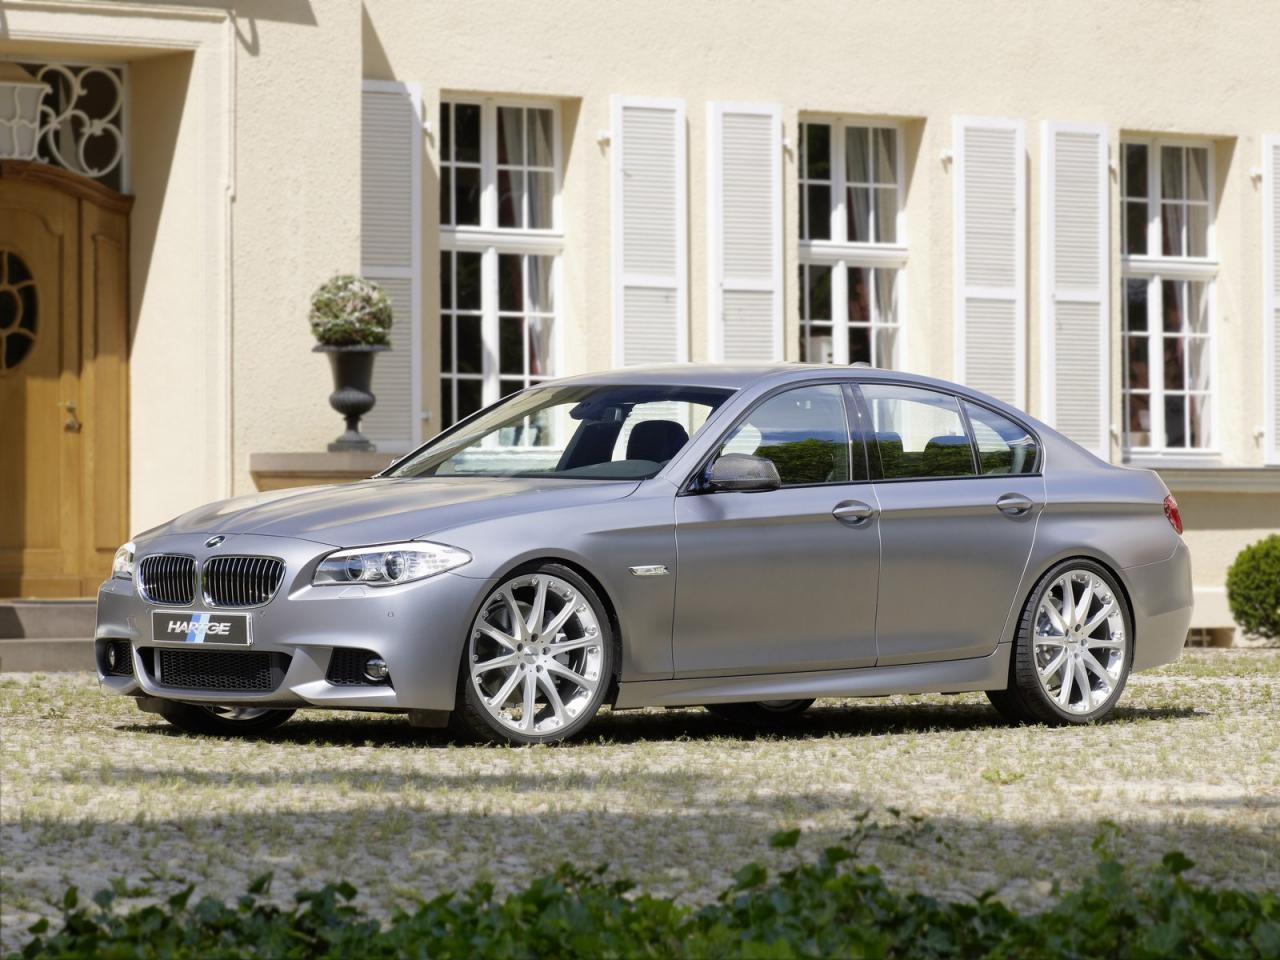 BMW 535d by Hartge (Hartge H35d)